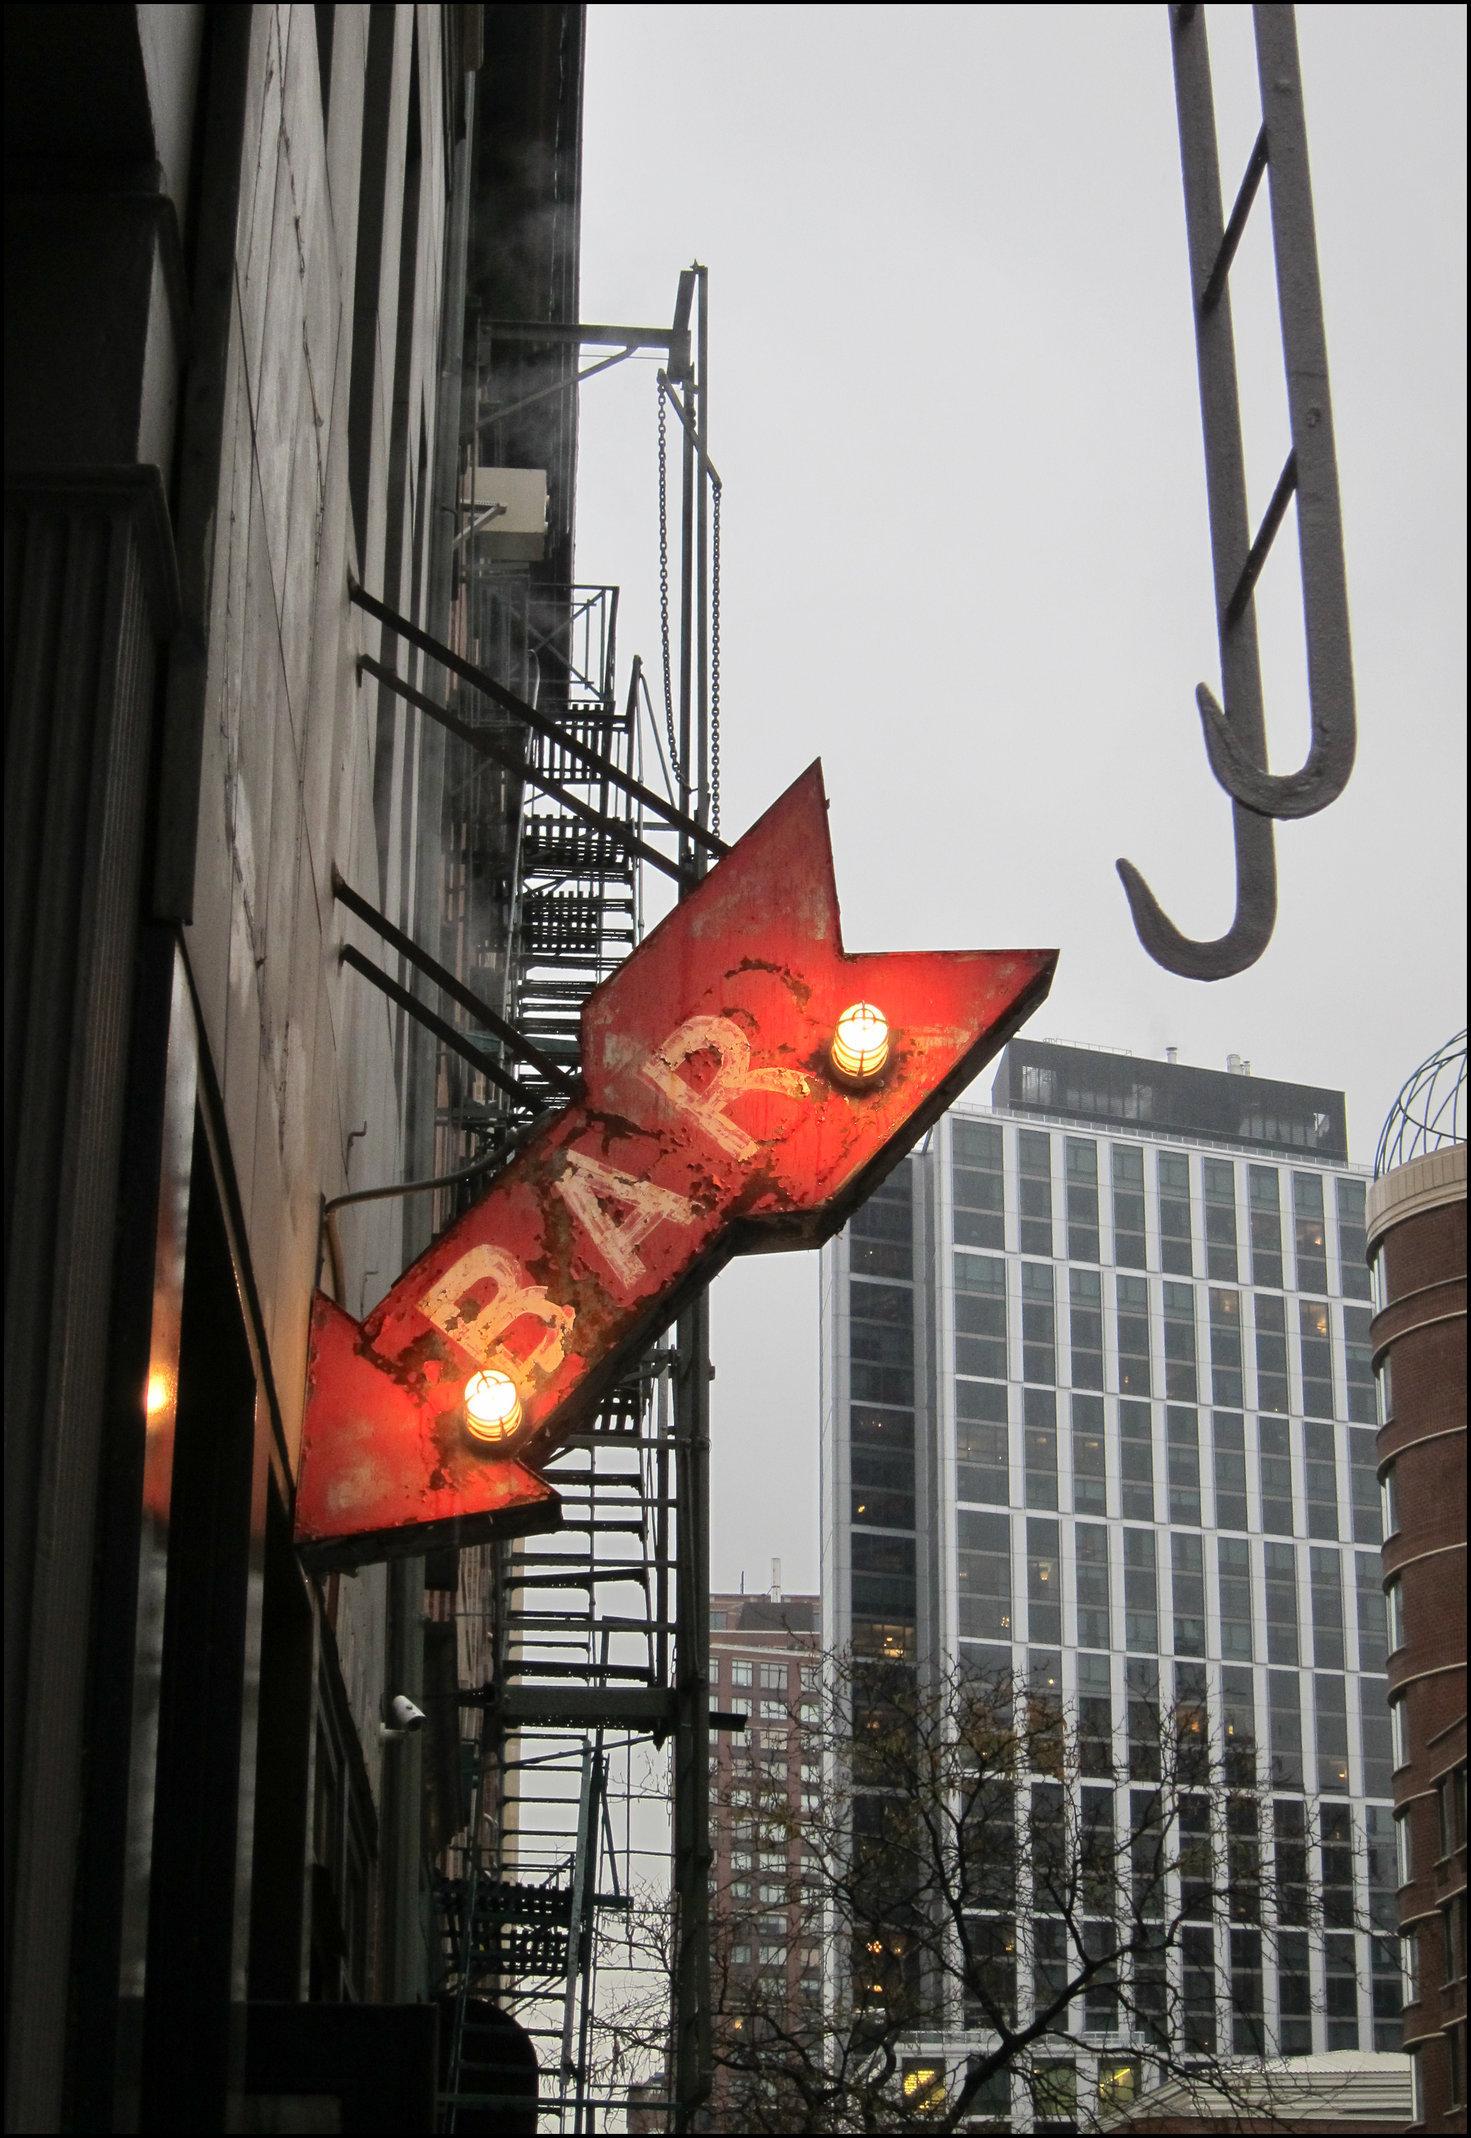 Bar, New York City, 2012